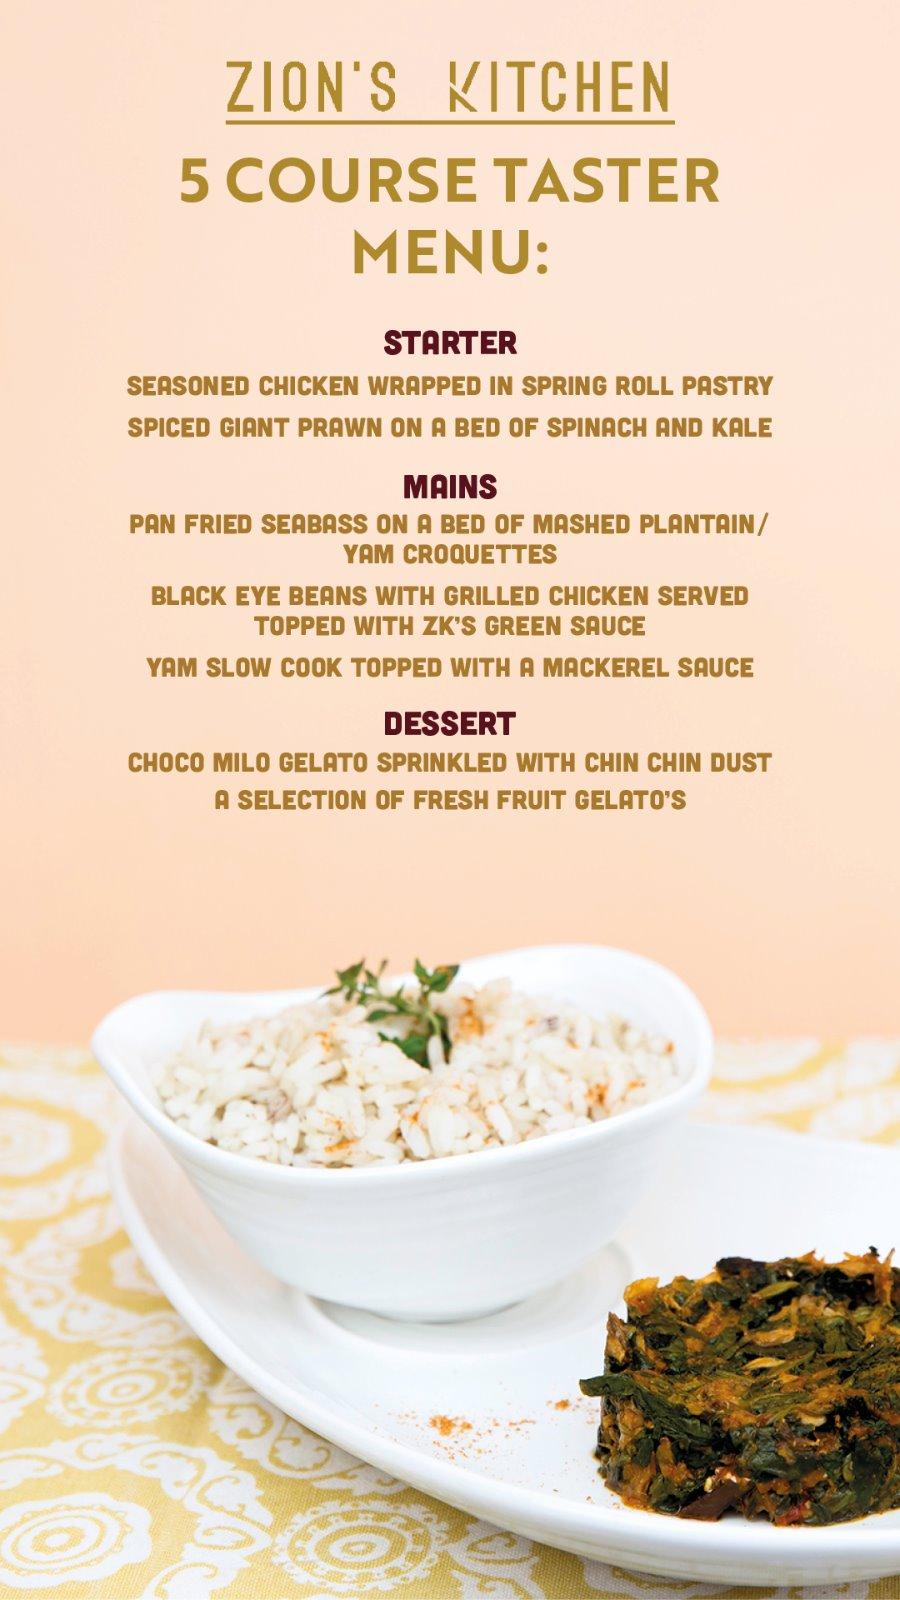 5 course taster menu